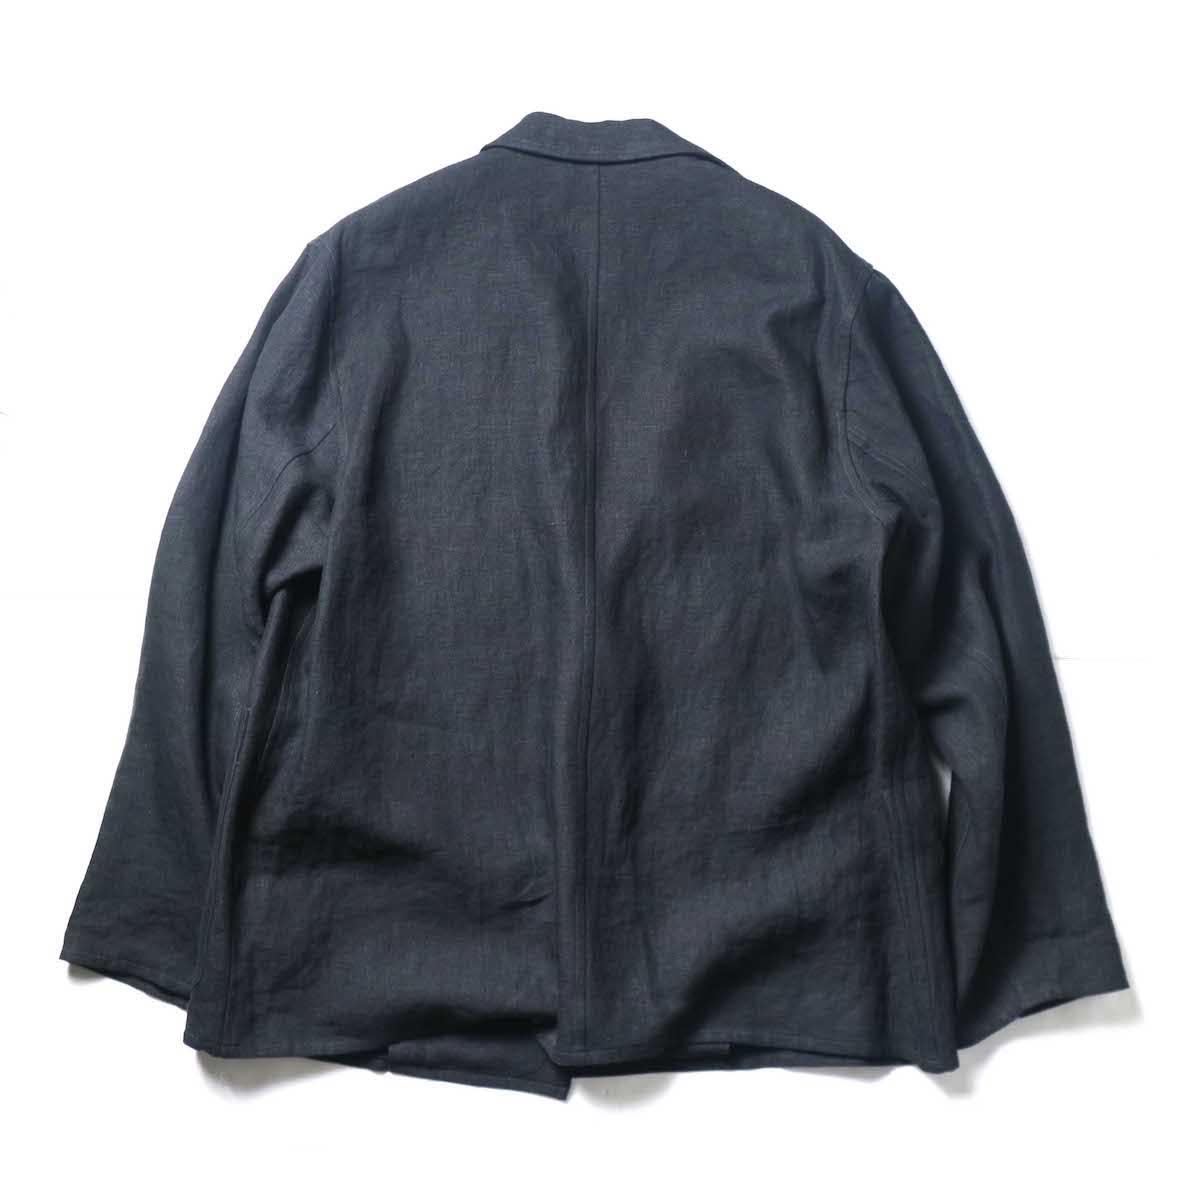 blurhms / Wash Linen Cardigan Jacket (Black)背面